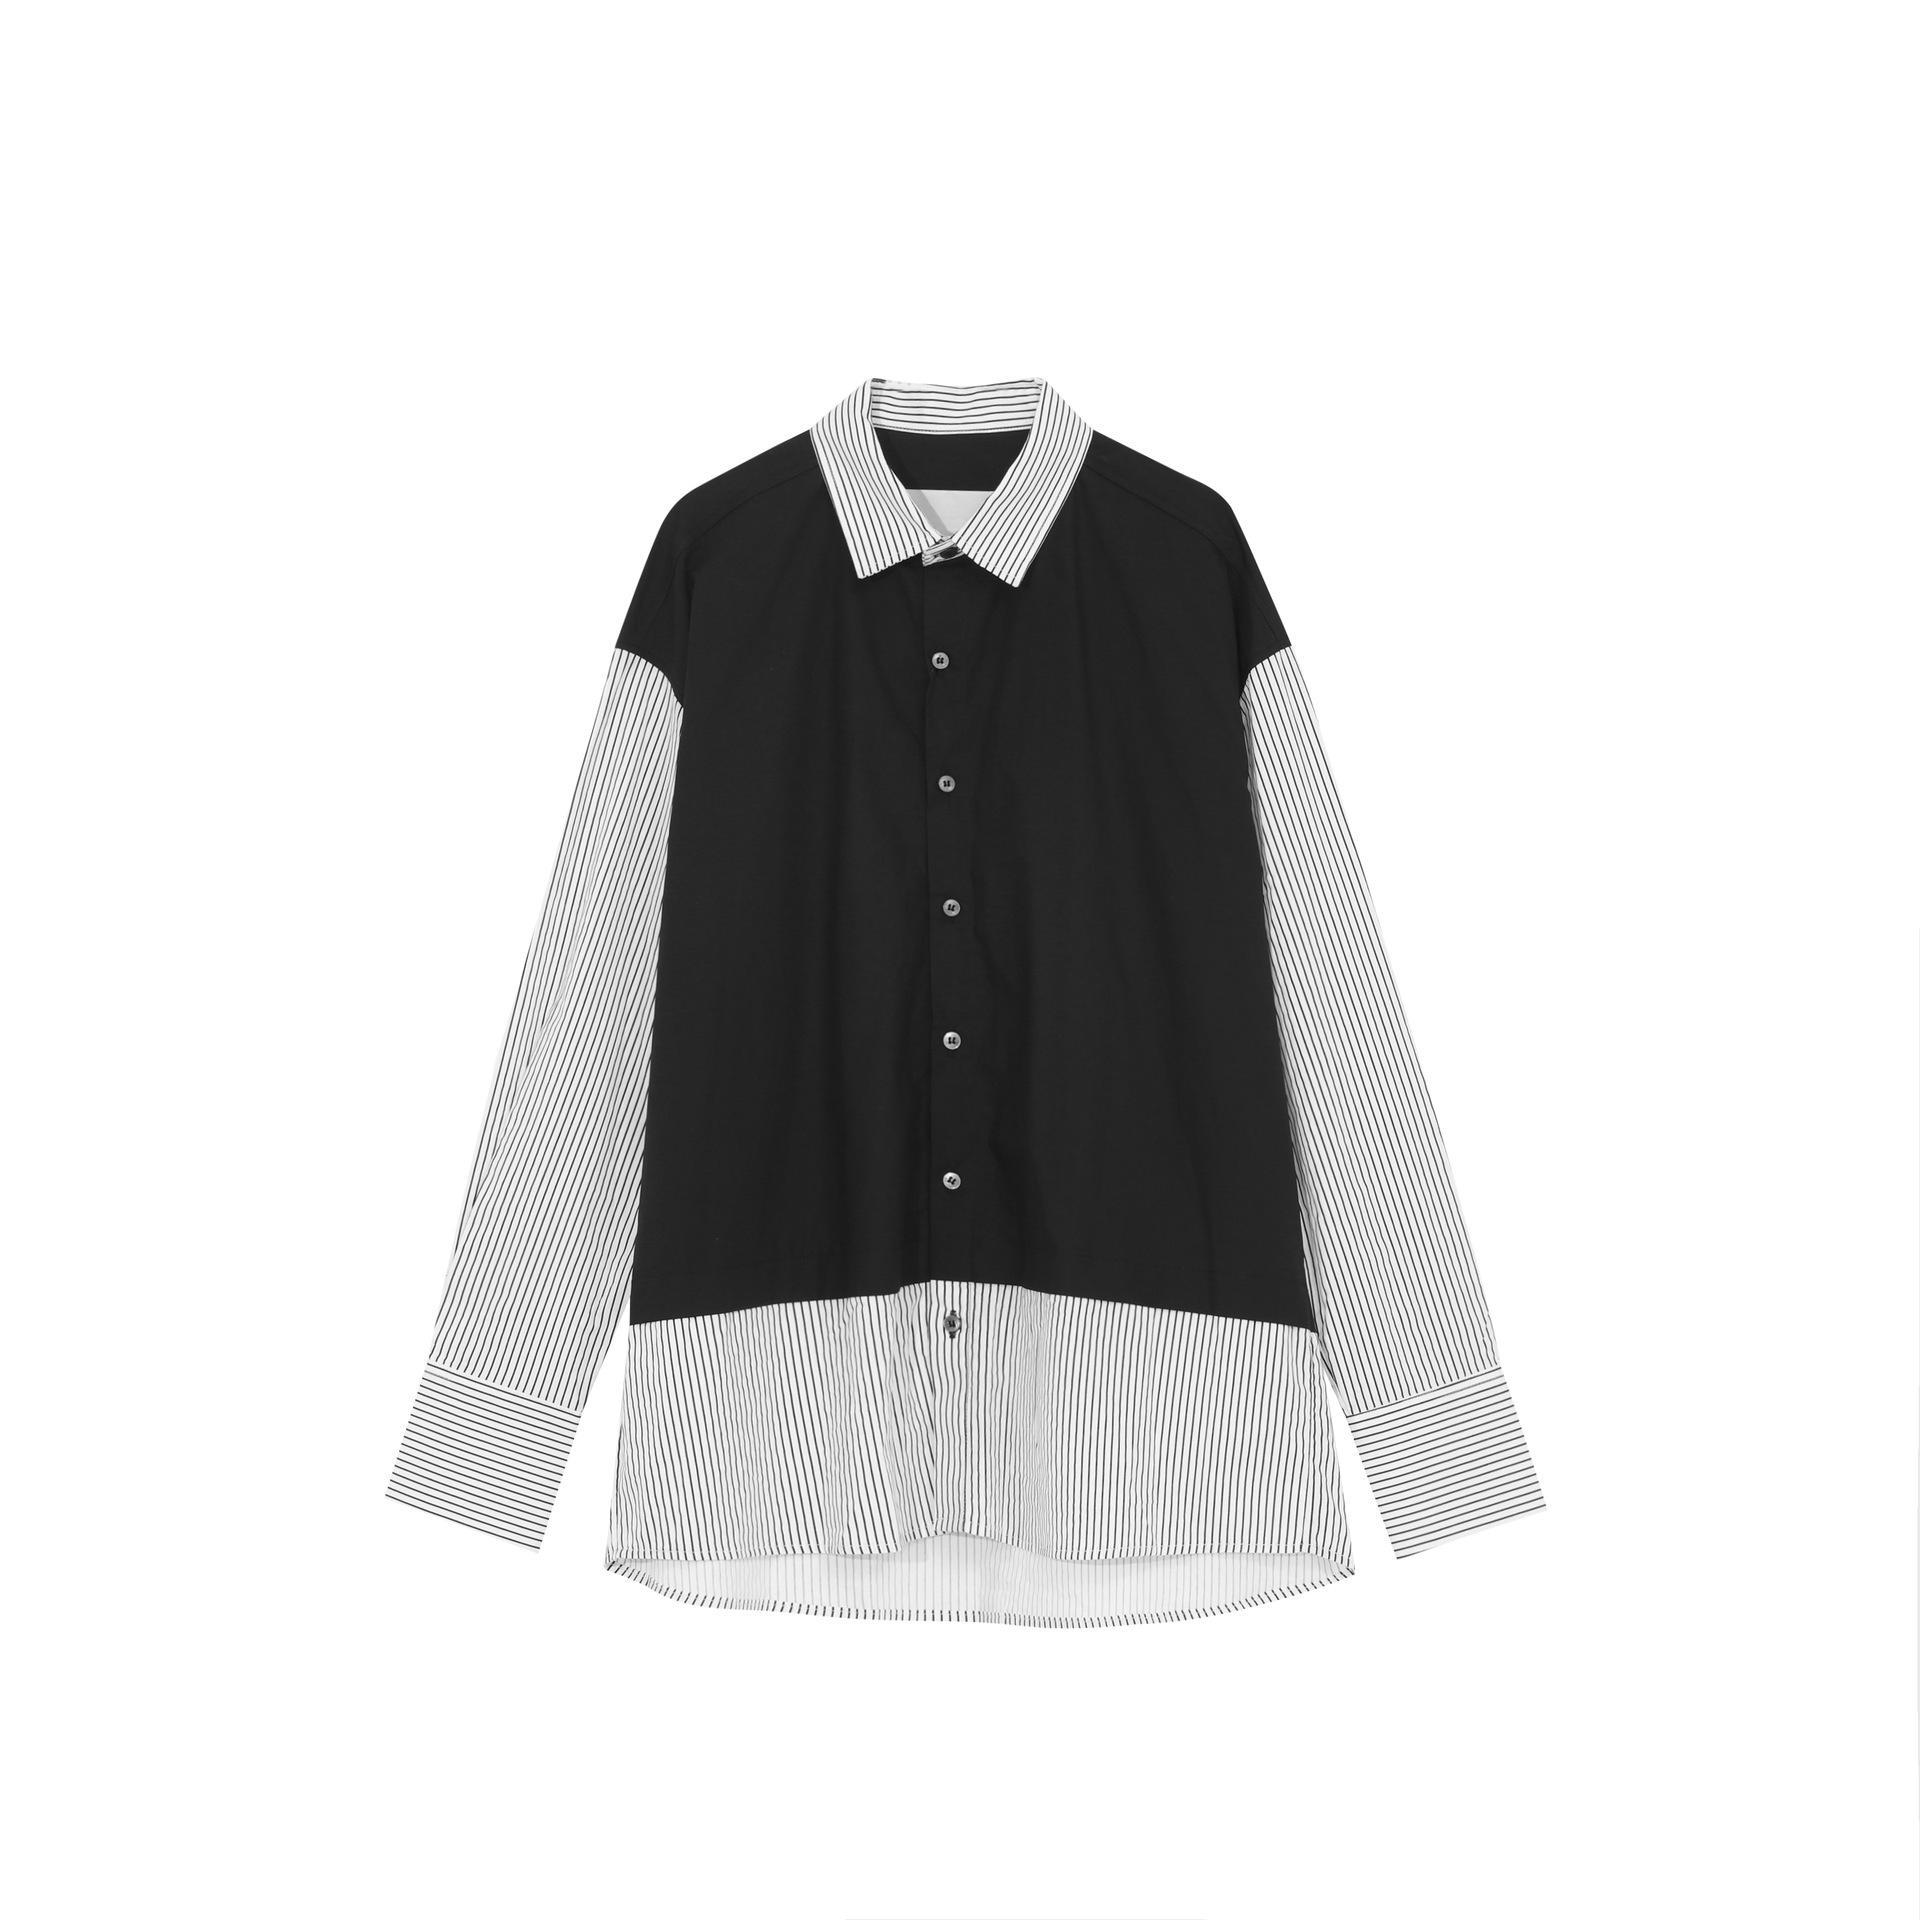 Hombres informal camisa a rayas de manga larga de empalme macho Japón Streetwear Hip Hop flojos Moda Vintage camisas